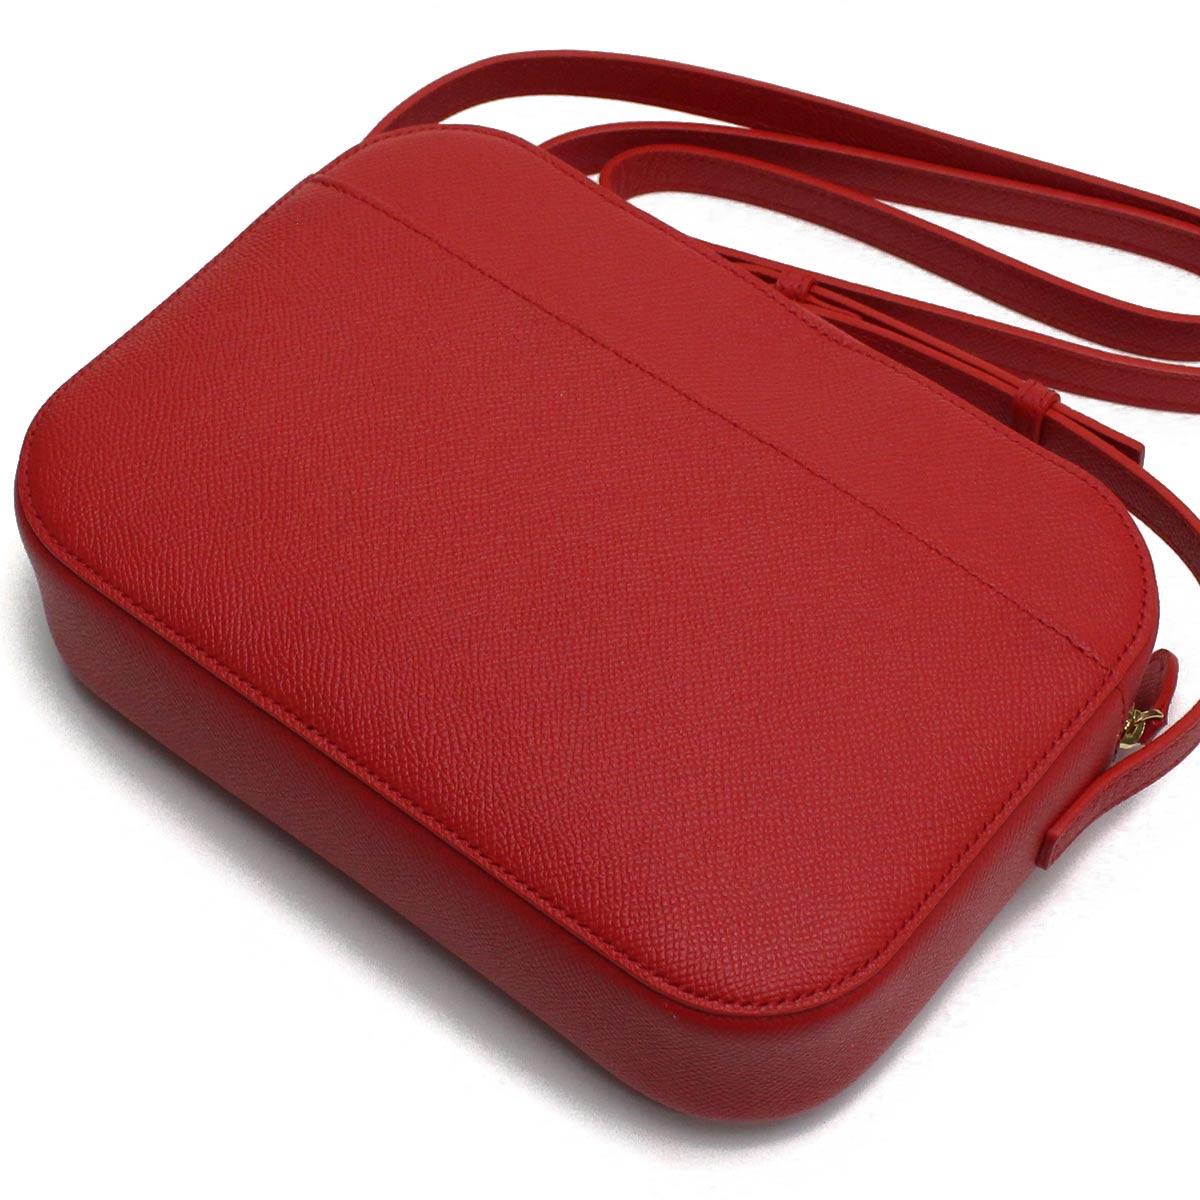 bas prix c192b 4b615 Take バレンシアガ BALENCIAGA building slant; shoulder bag 558172 0OTDM 6575 ROUGE  COQU/L NOIR red system